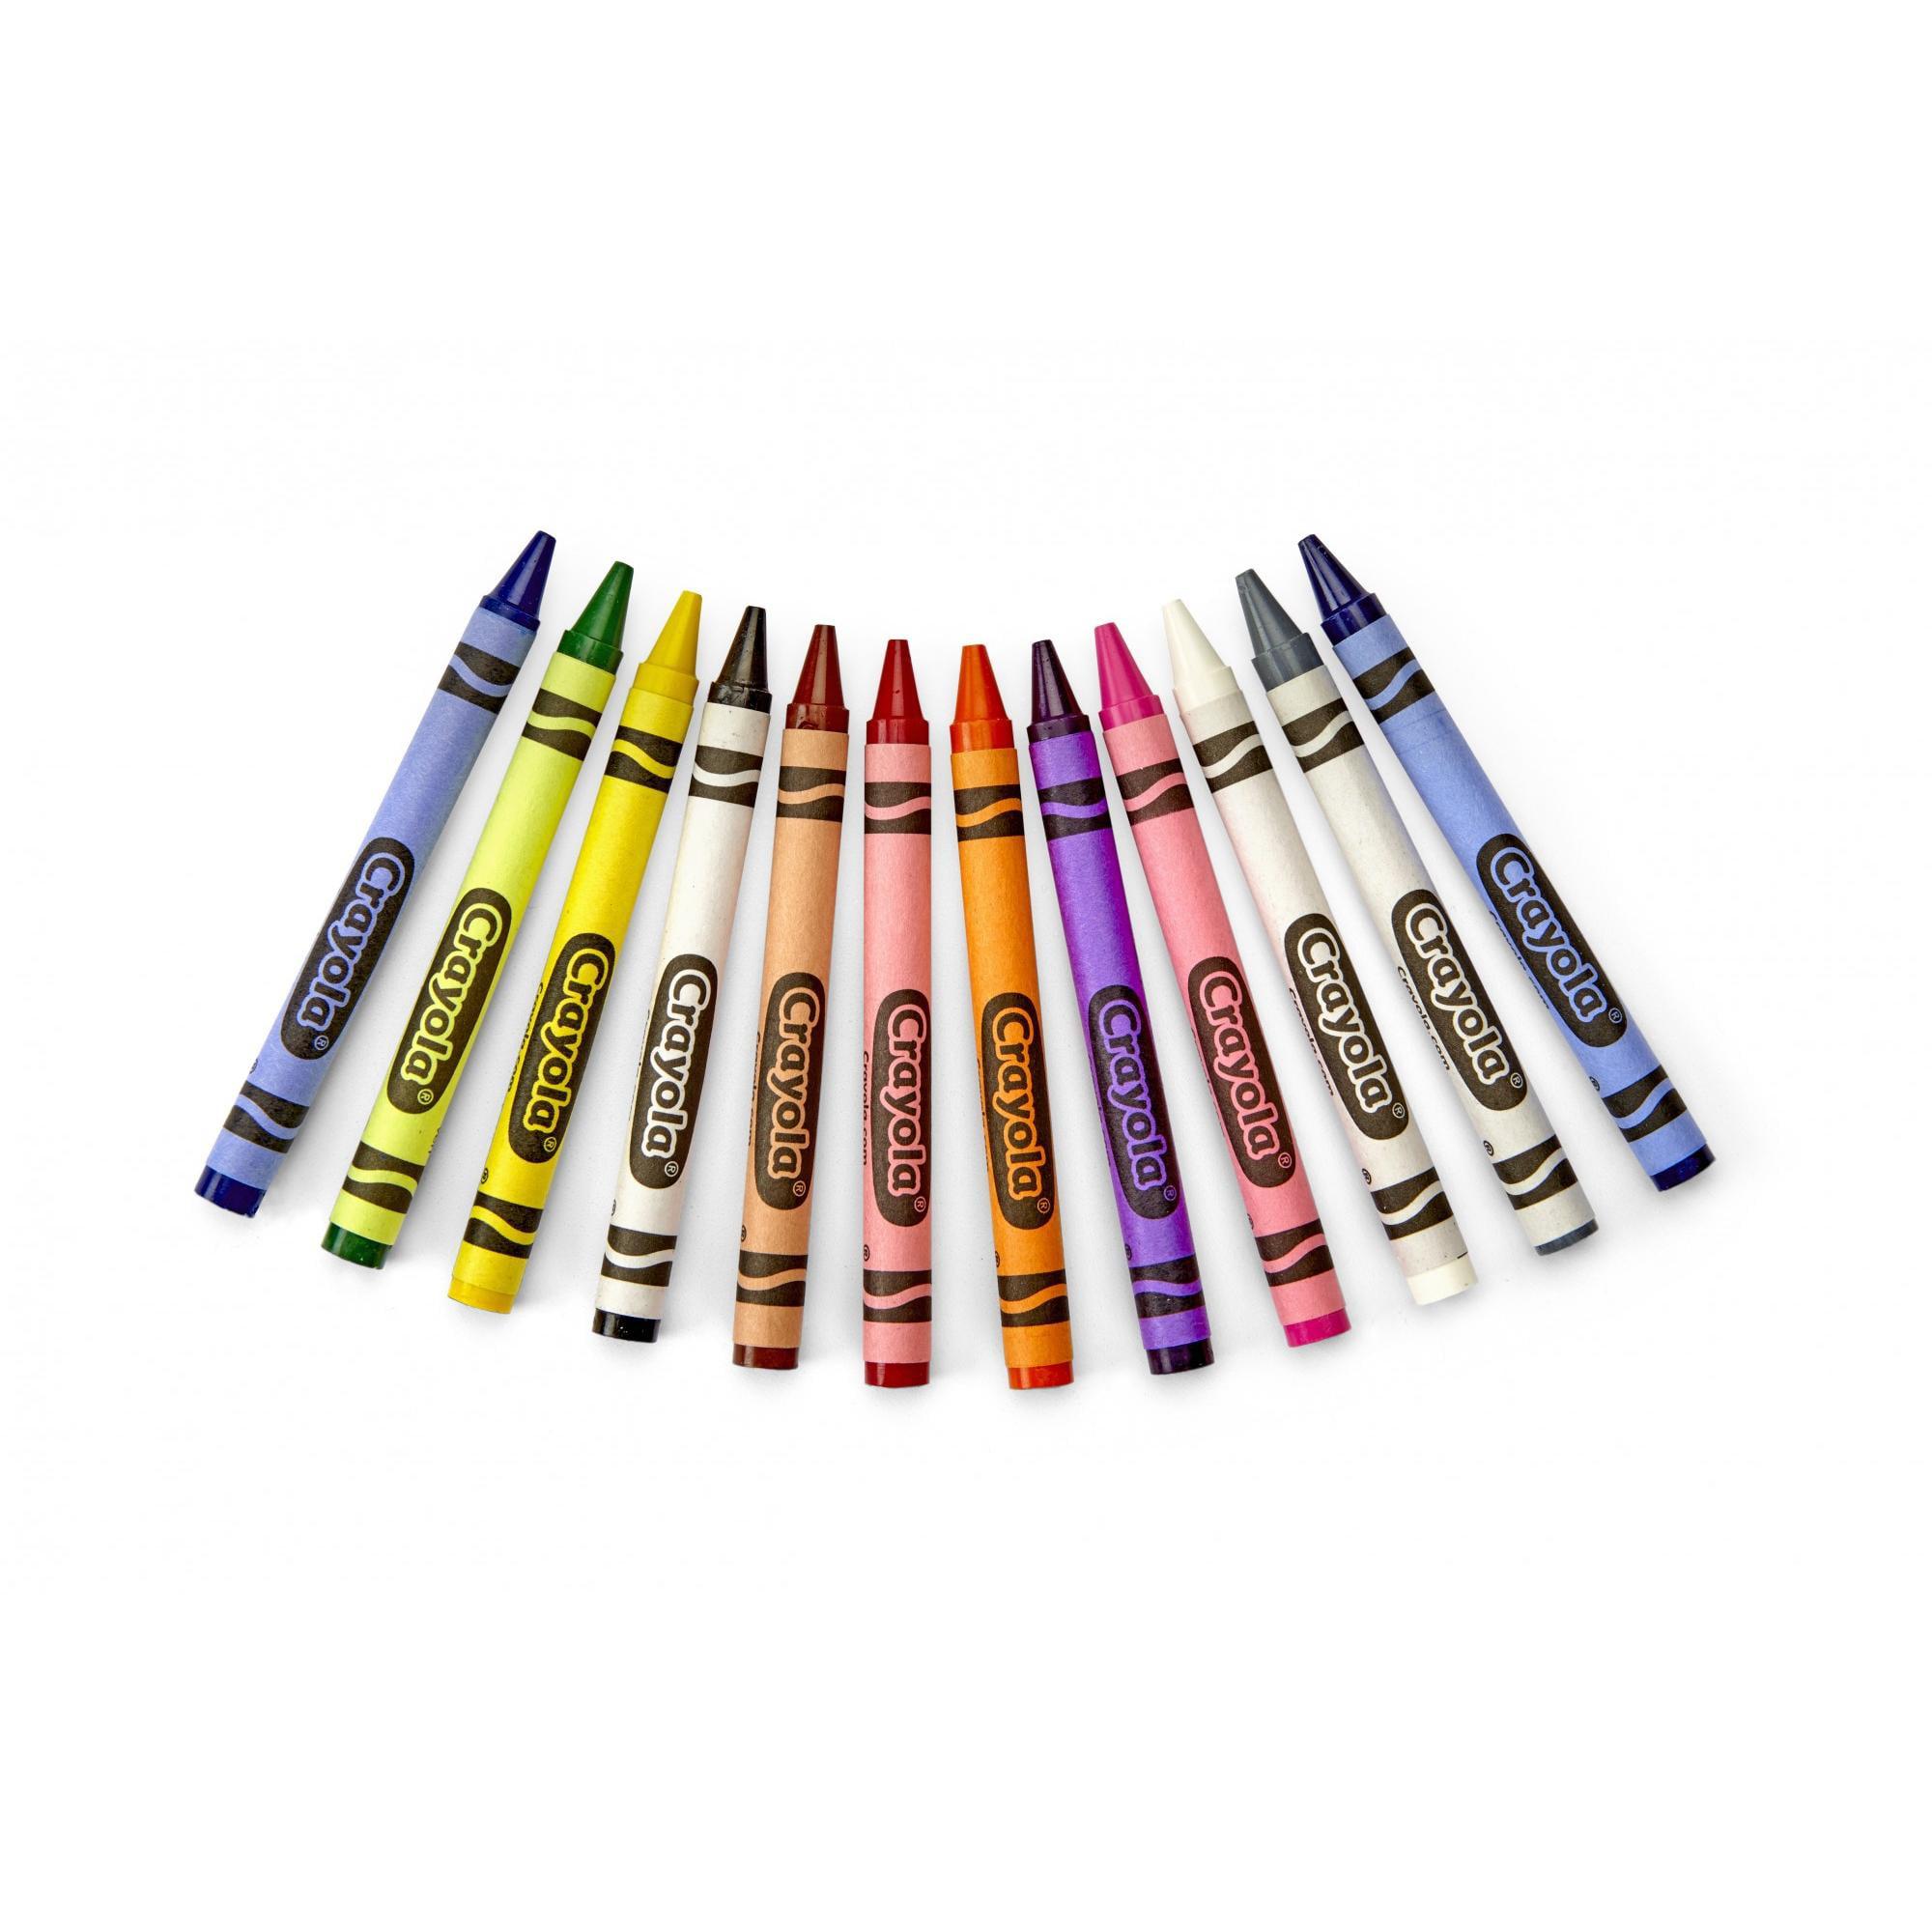 Crayola 24-Ct Crayons 50¢ Ship...